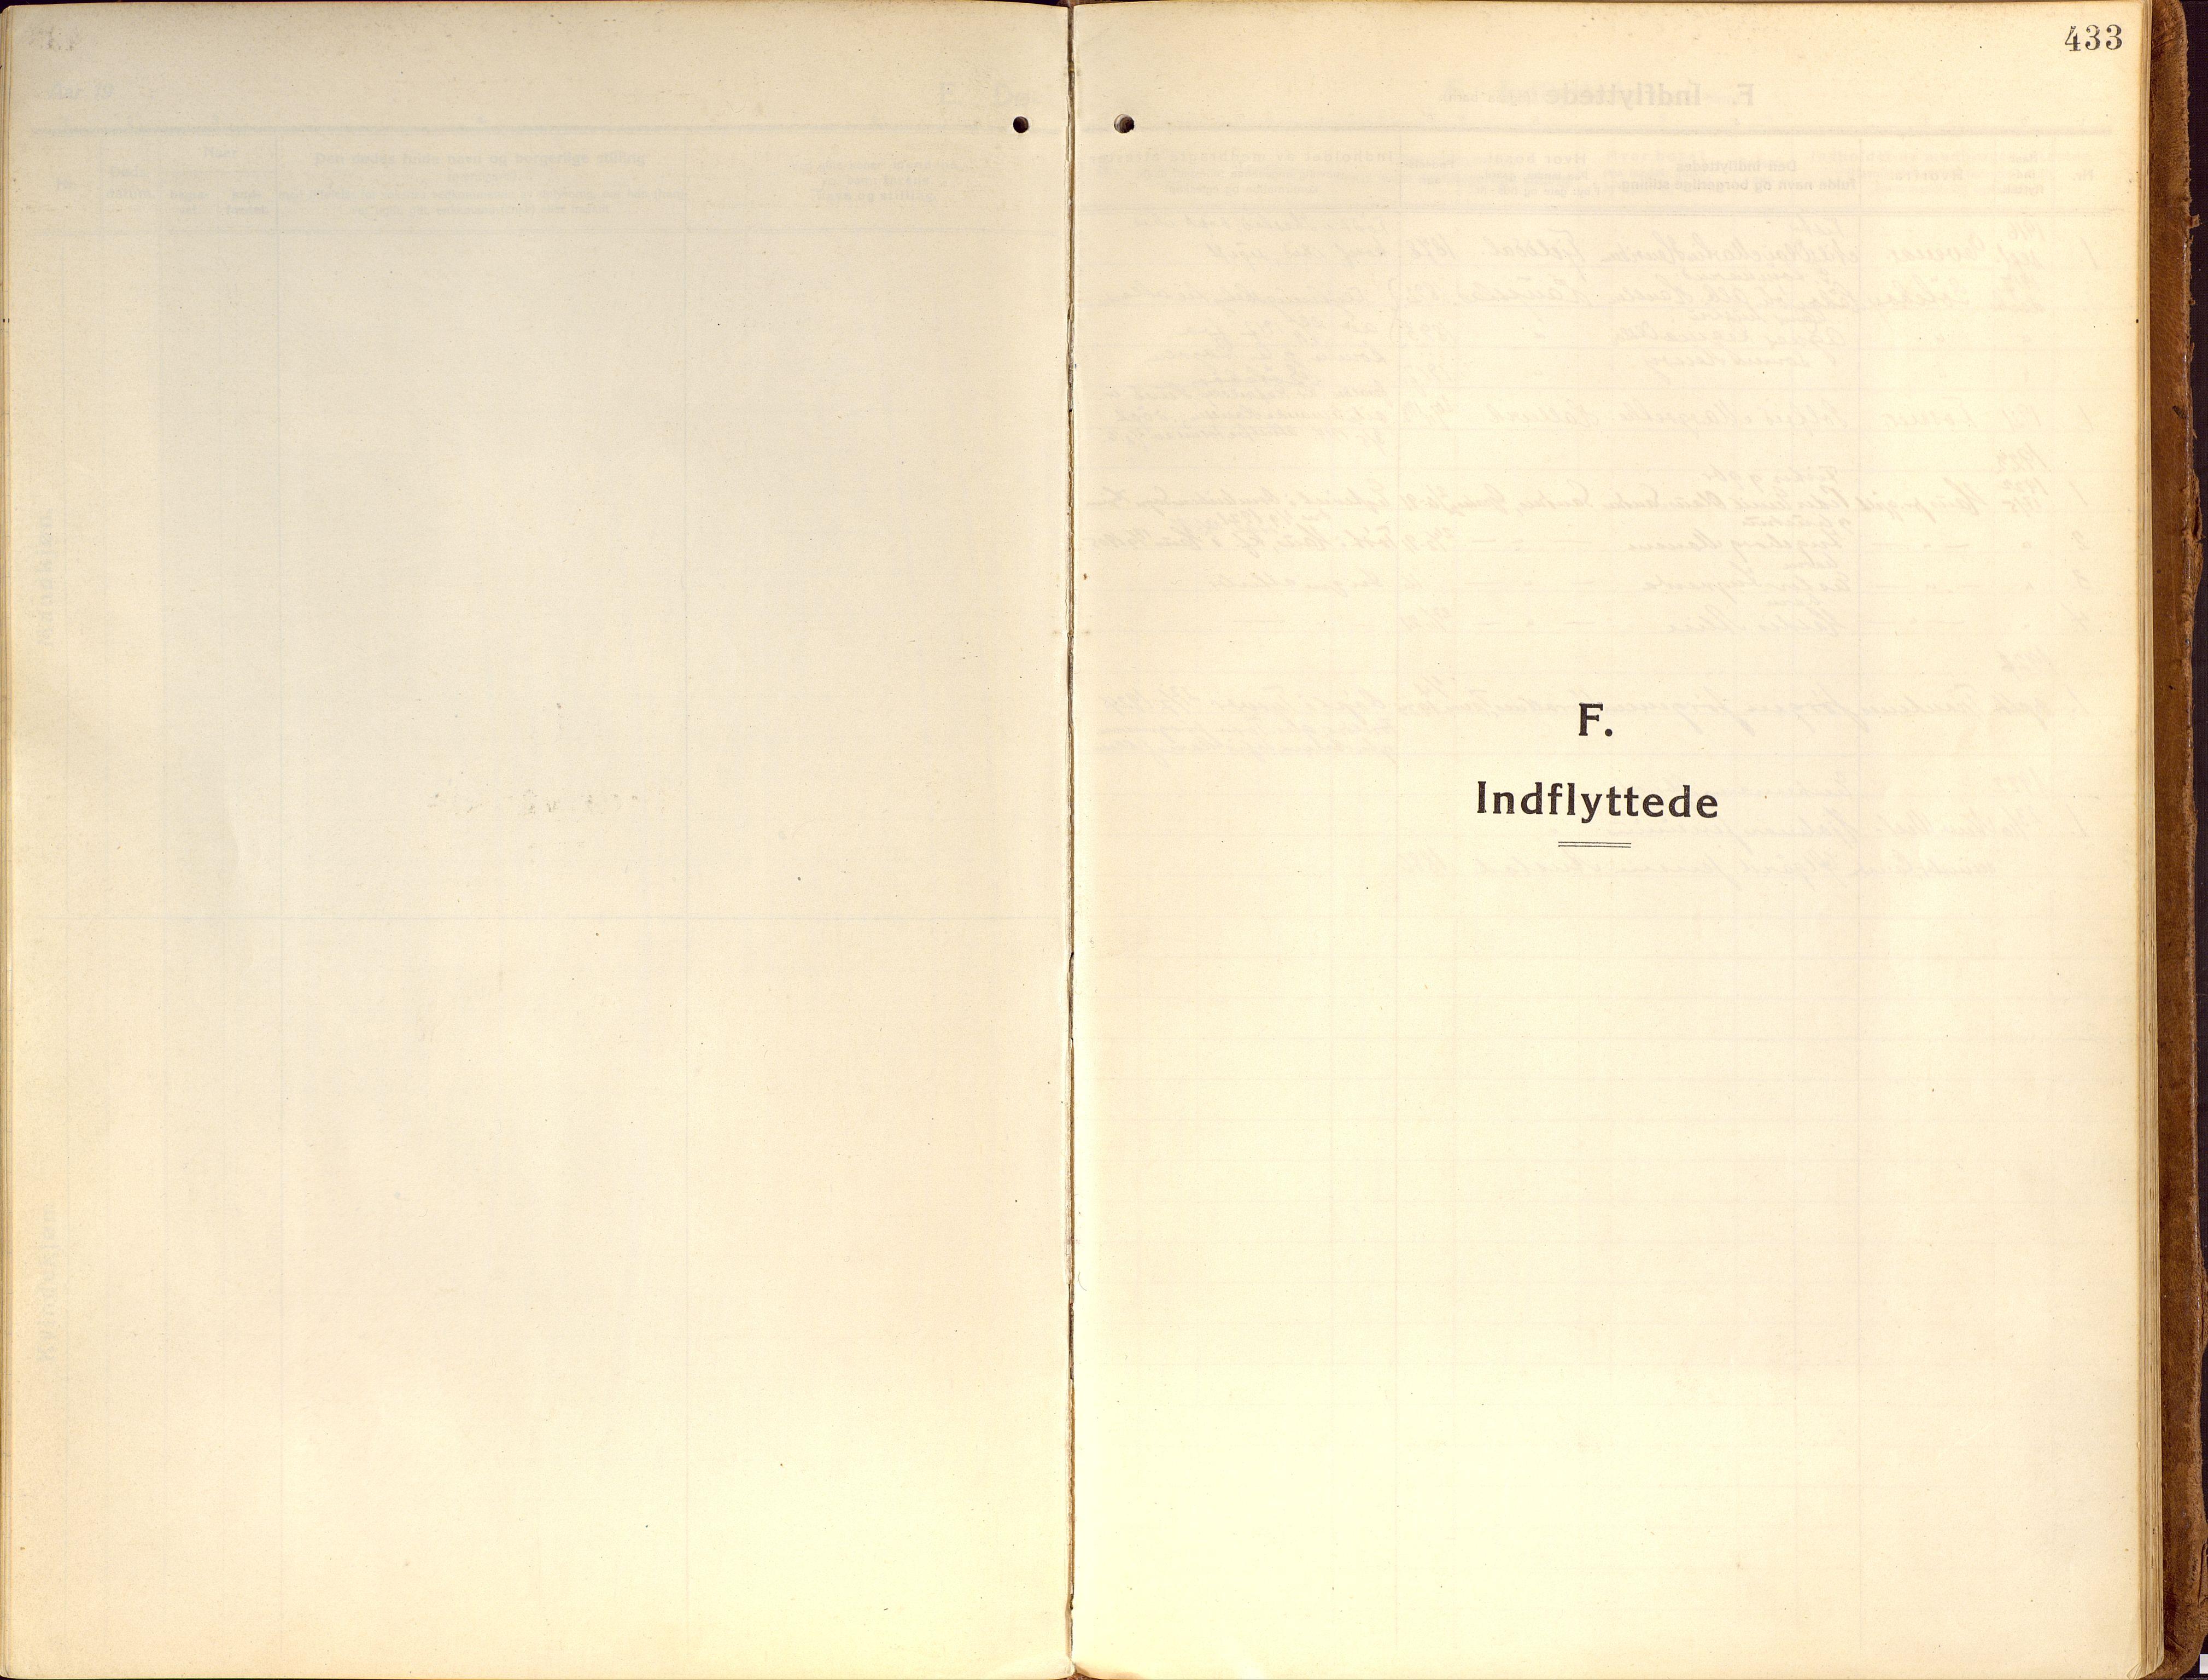 SATØ, Ibestad sokneprestembete, Ministerialbok nr. 18, 1915-1929, s. 433